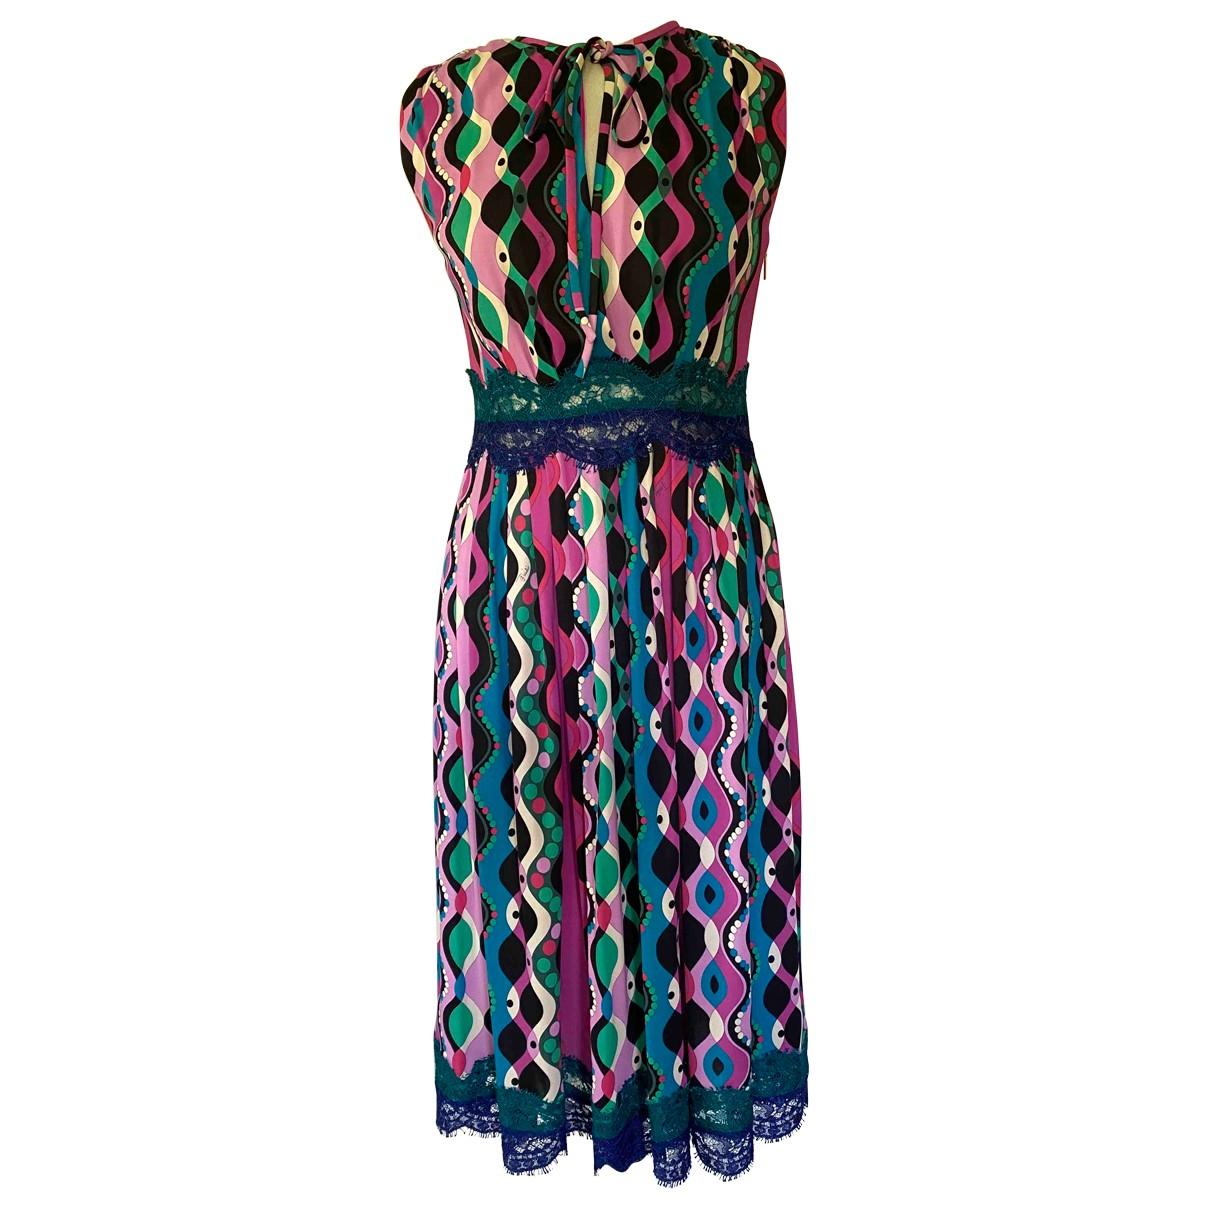 Emilio Pucci \N Multicolour dress for Women 36 FR